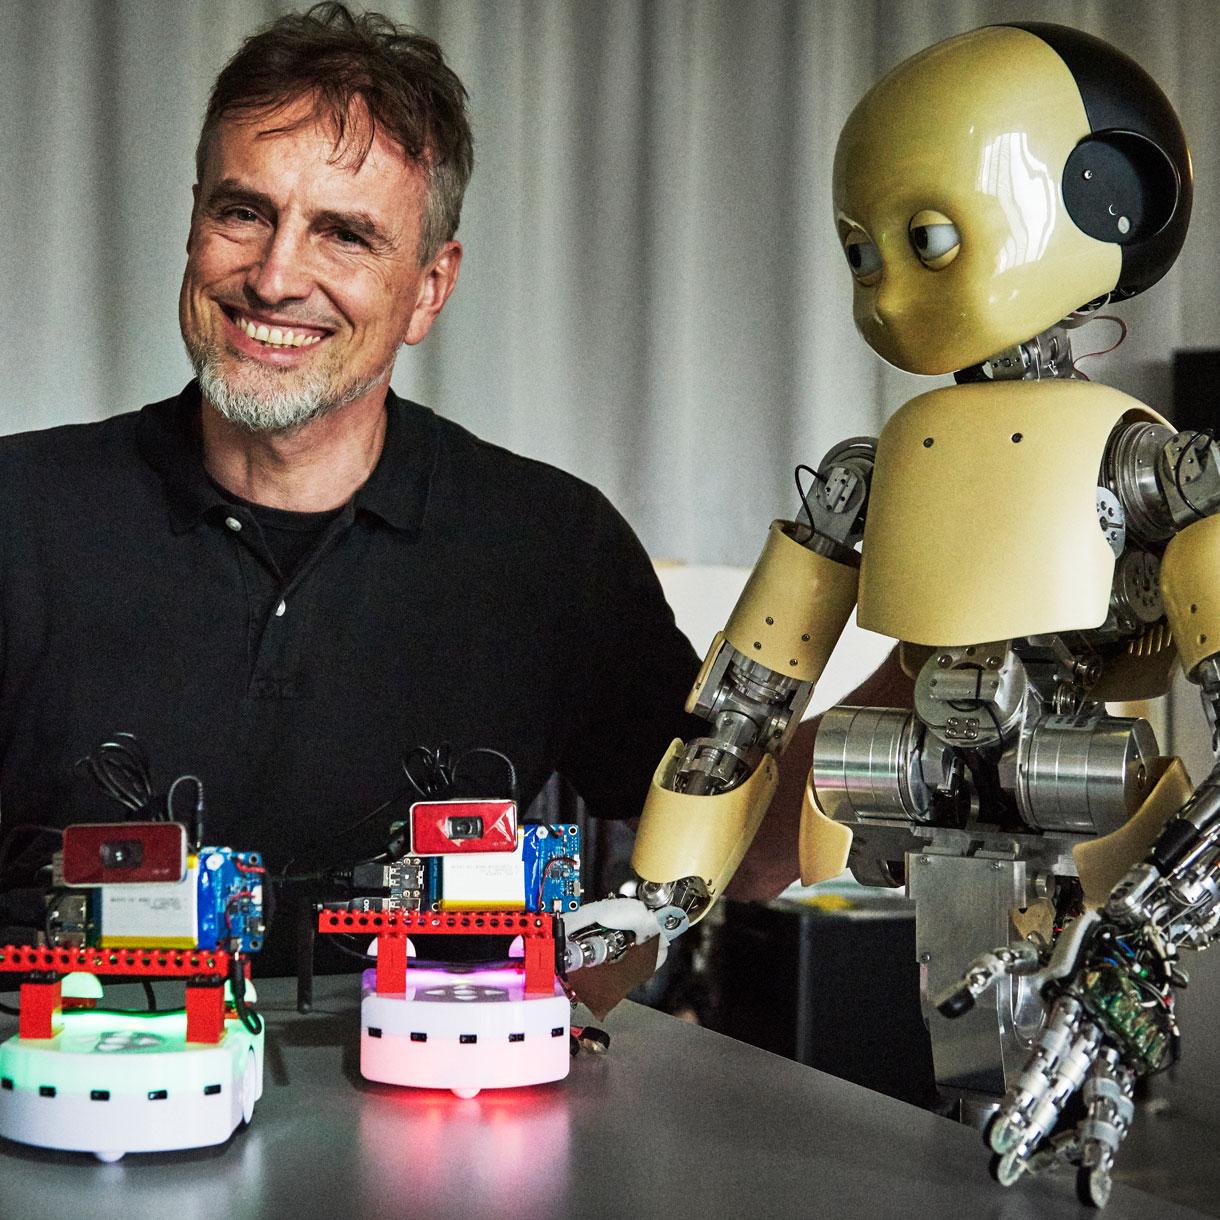 roboter für kinder test